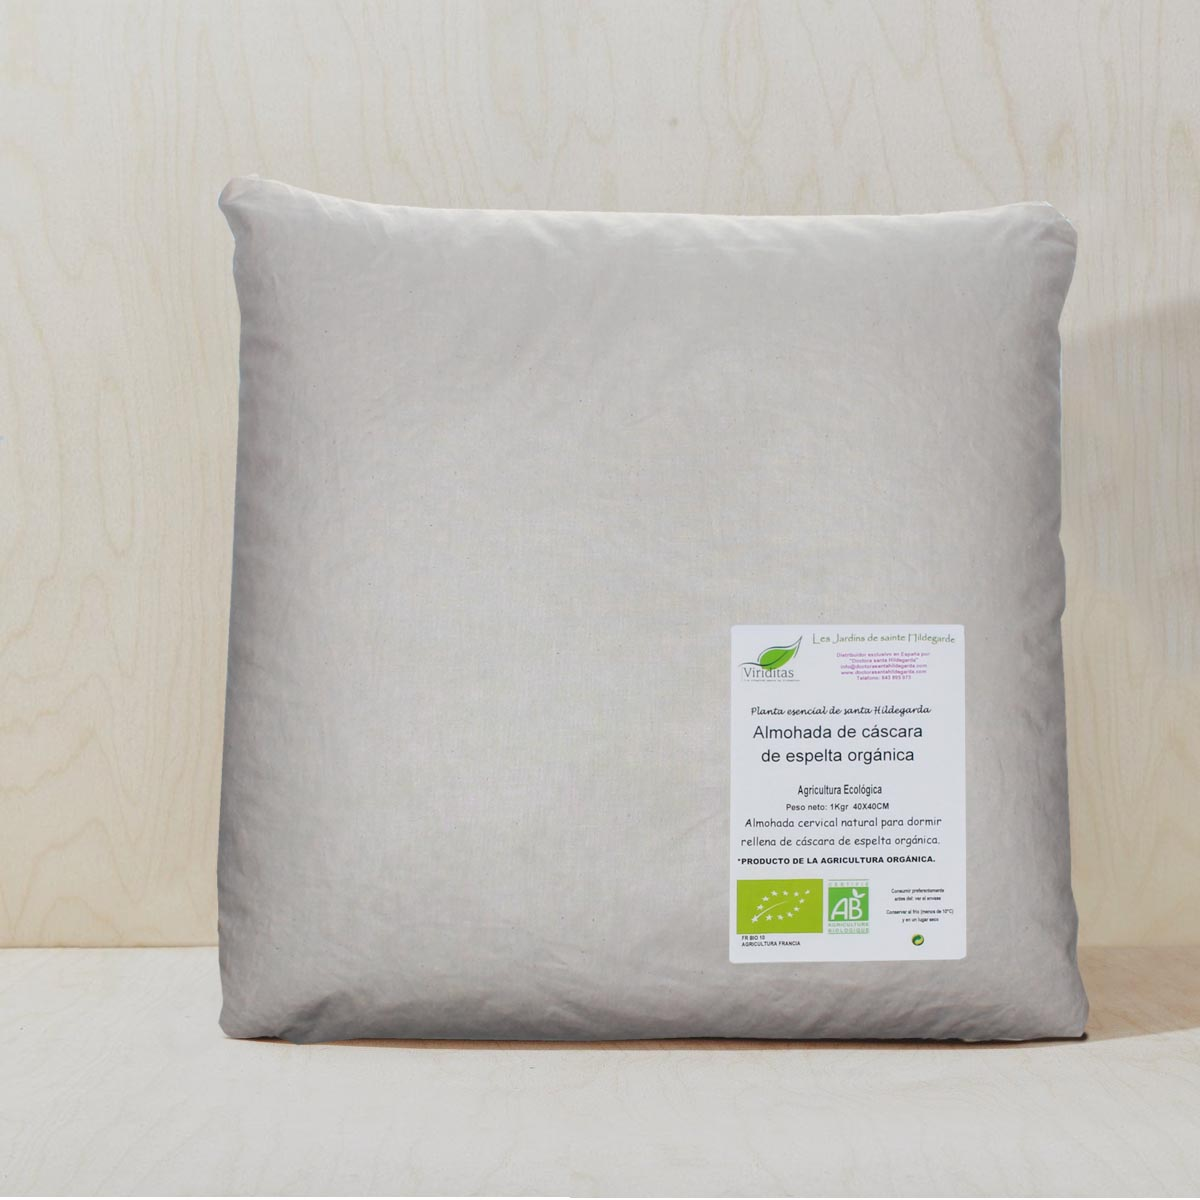 10 kg de espelta org/ánica para almohadas.